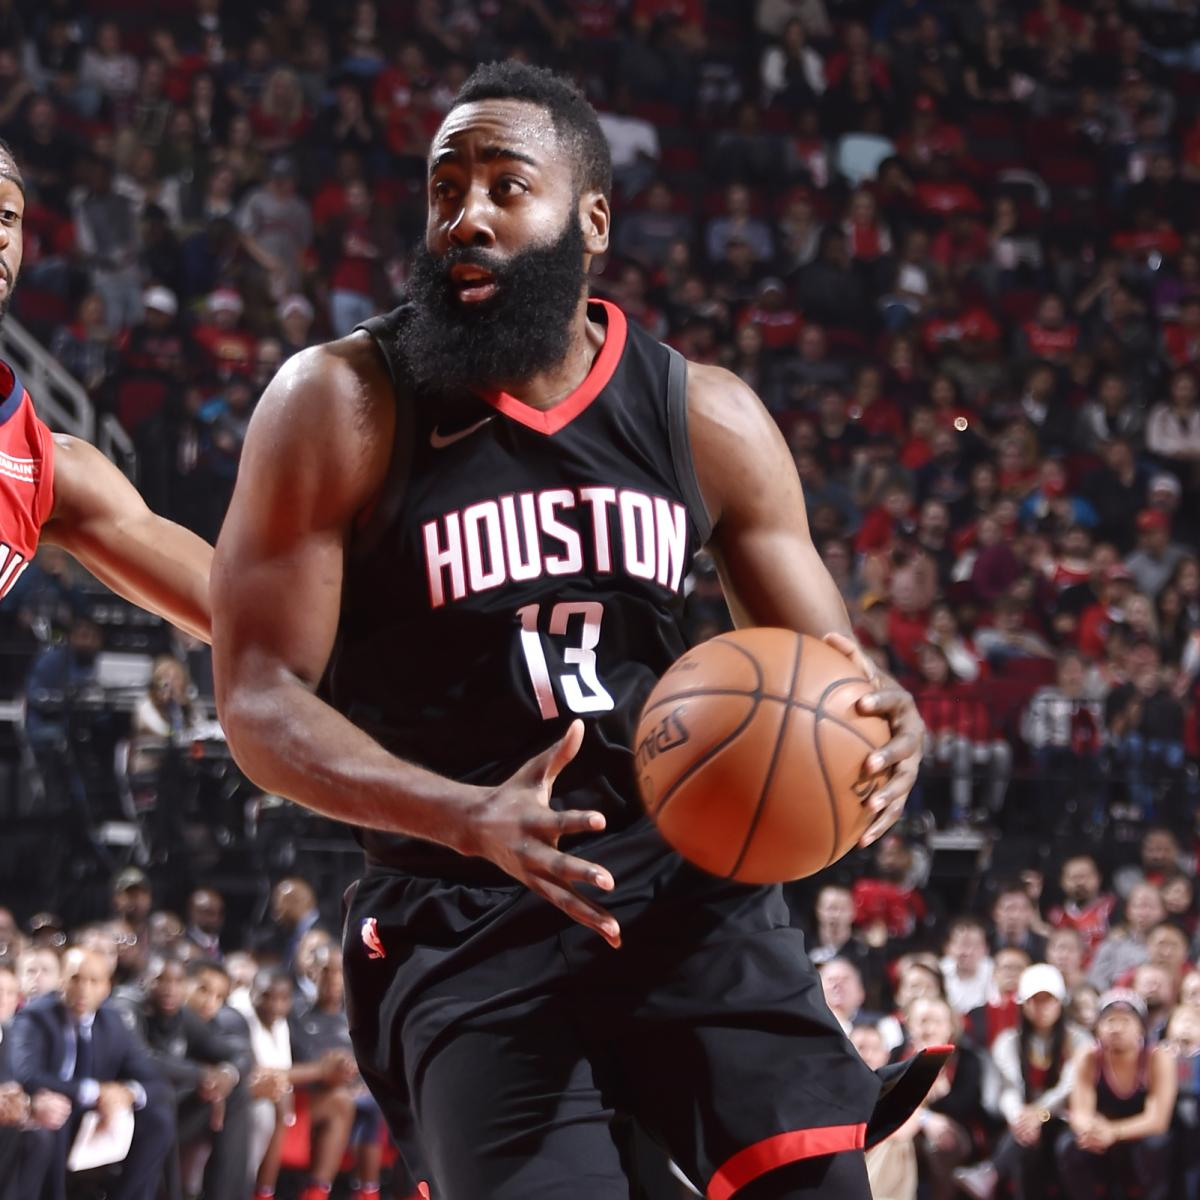 Houston Rockets Win Last Night: James Harden, Rockets Beat Pelicans Without Anthony Davis